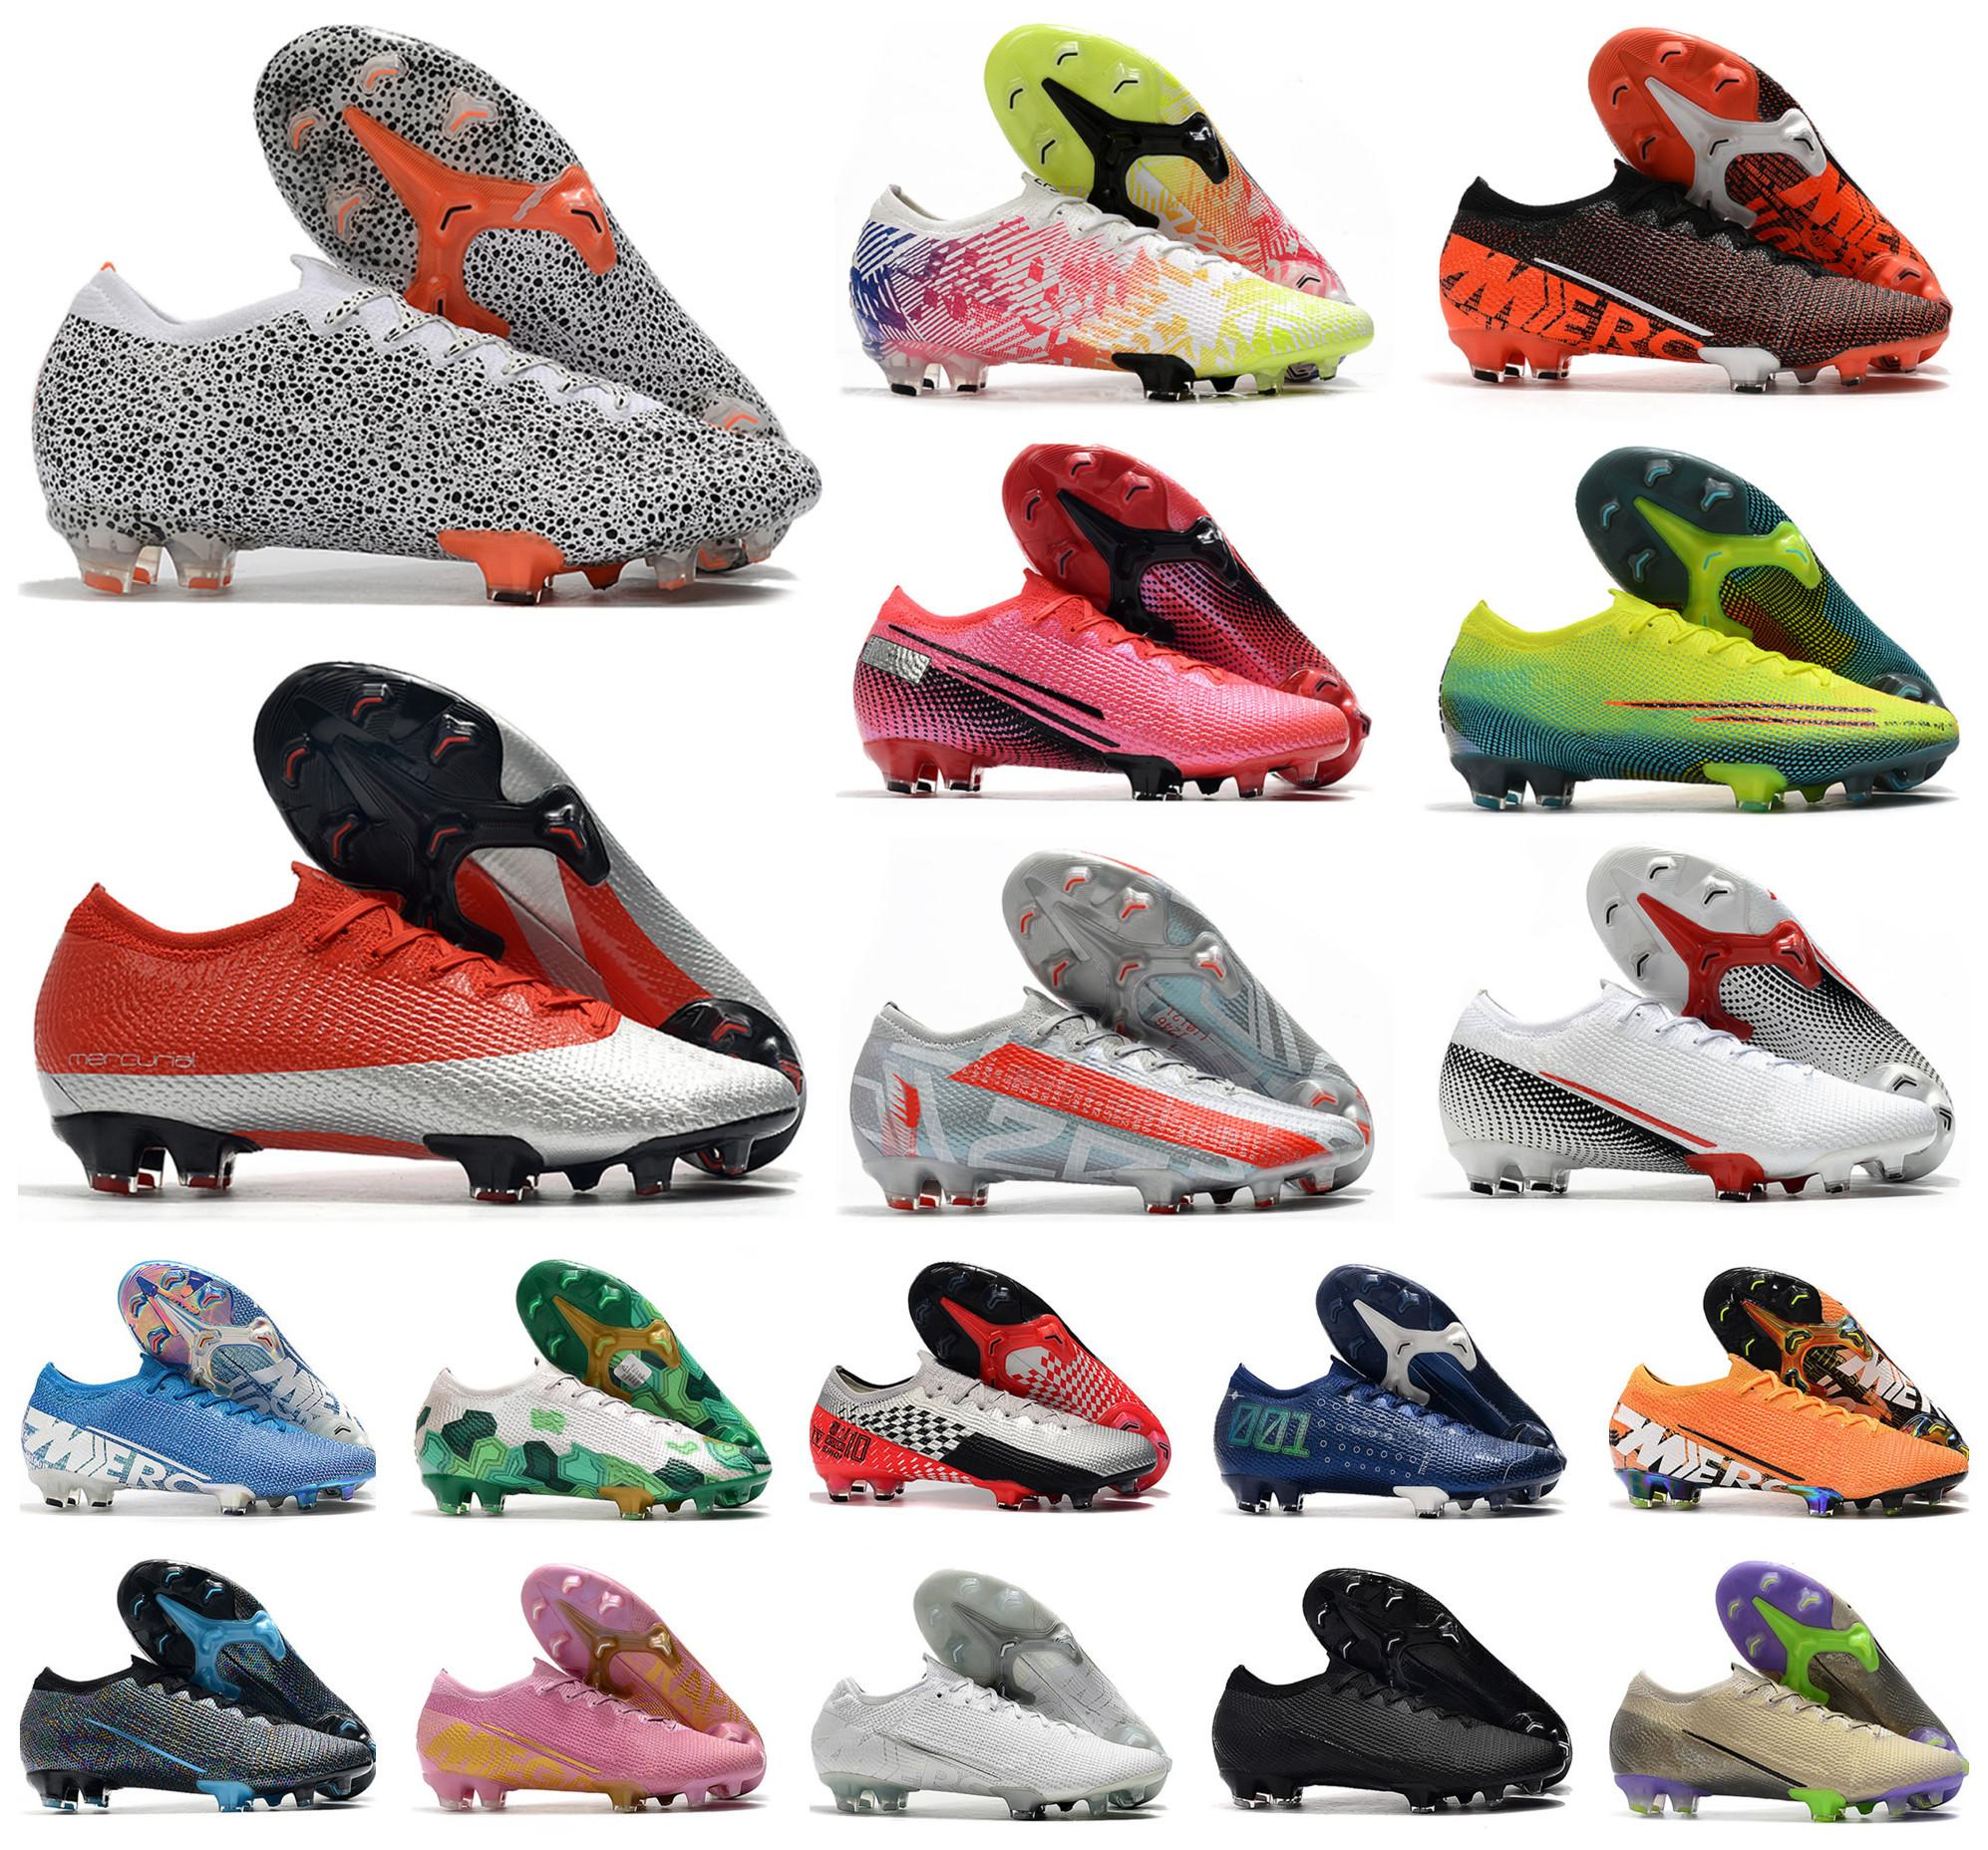 2020 Männer Mercurial Dämpfe XIII Elite FG 13 CR7 SAFARI Ronaldo Neymar NJR Rosa 360 Frauen Junge Fußball-Fußball-Boots-Schuh-Größe 35-45